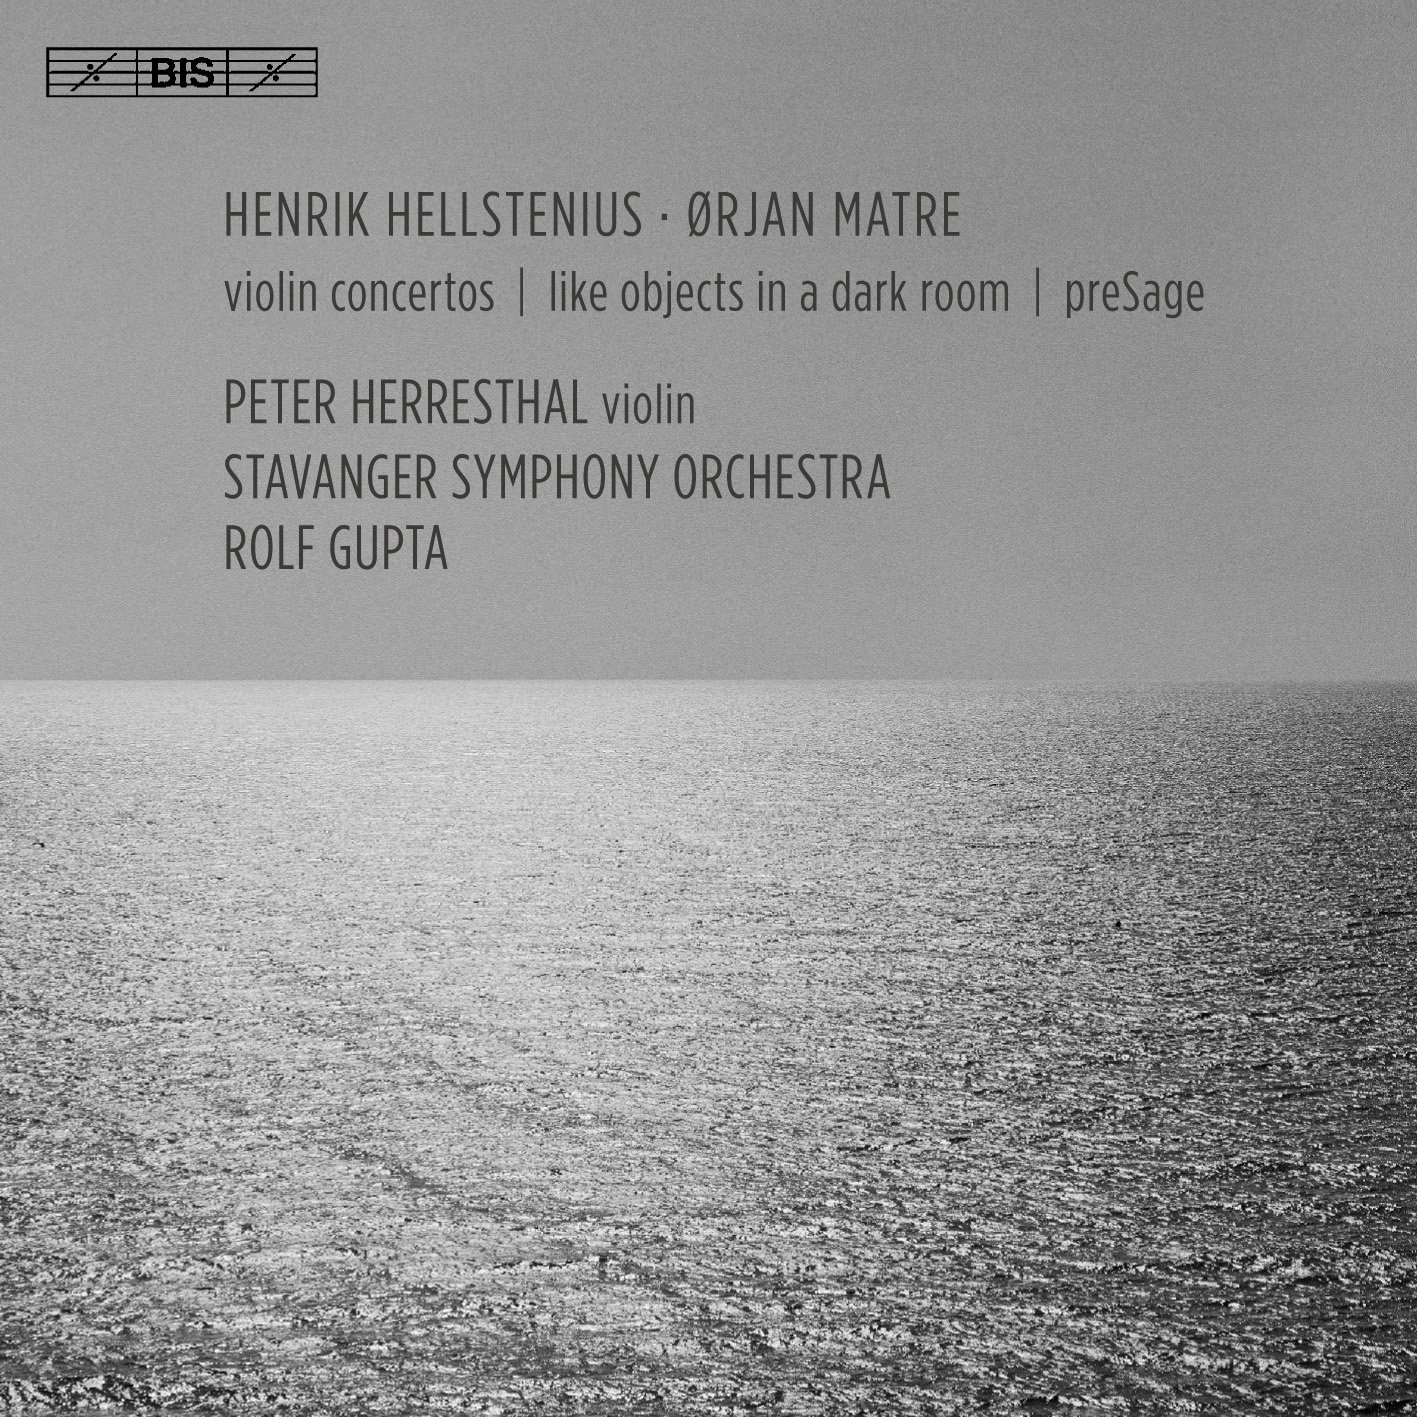 SACD : Peter Herresthal - Henrik Hellstenius & Orjan Matre: Violin Concertos (SACD)